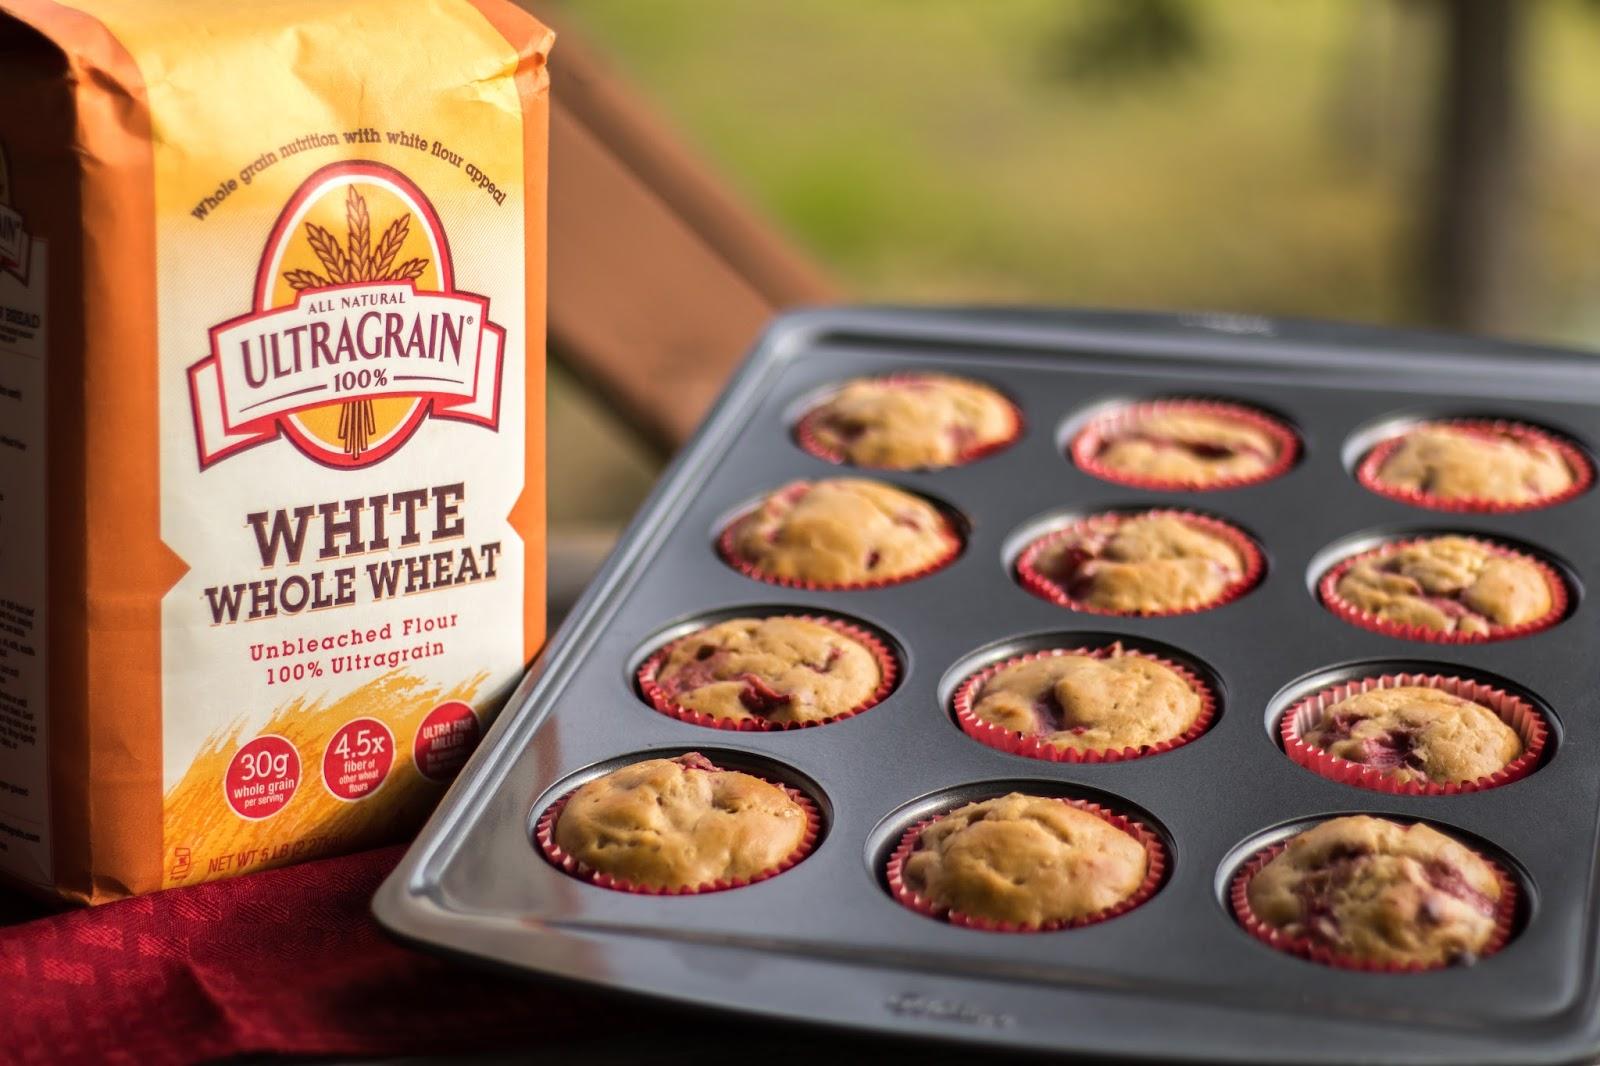 Fuel Your Passion: Ultragrain White Whole Wheat Strawberry Banana